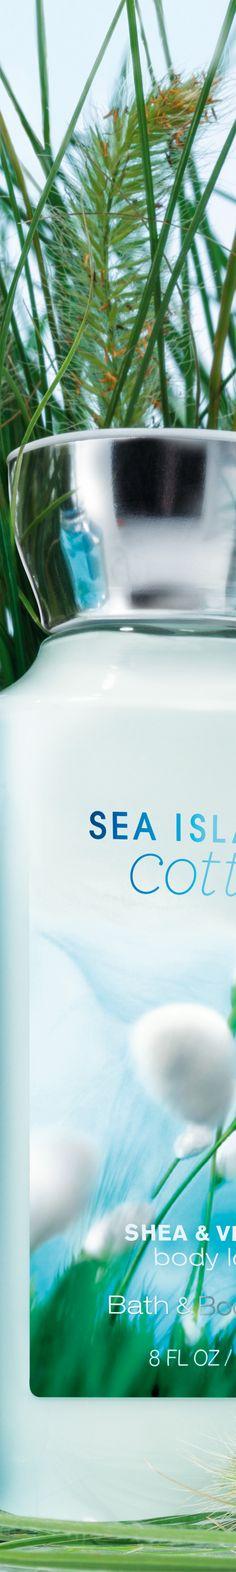 #SeaIslandCotton